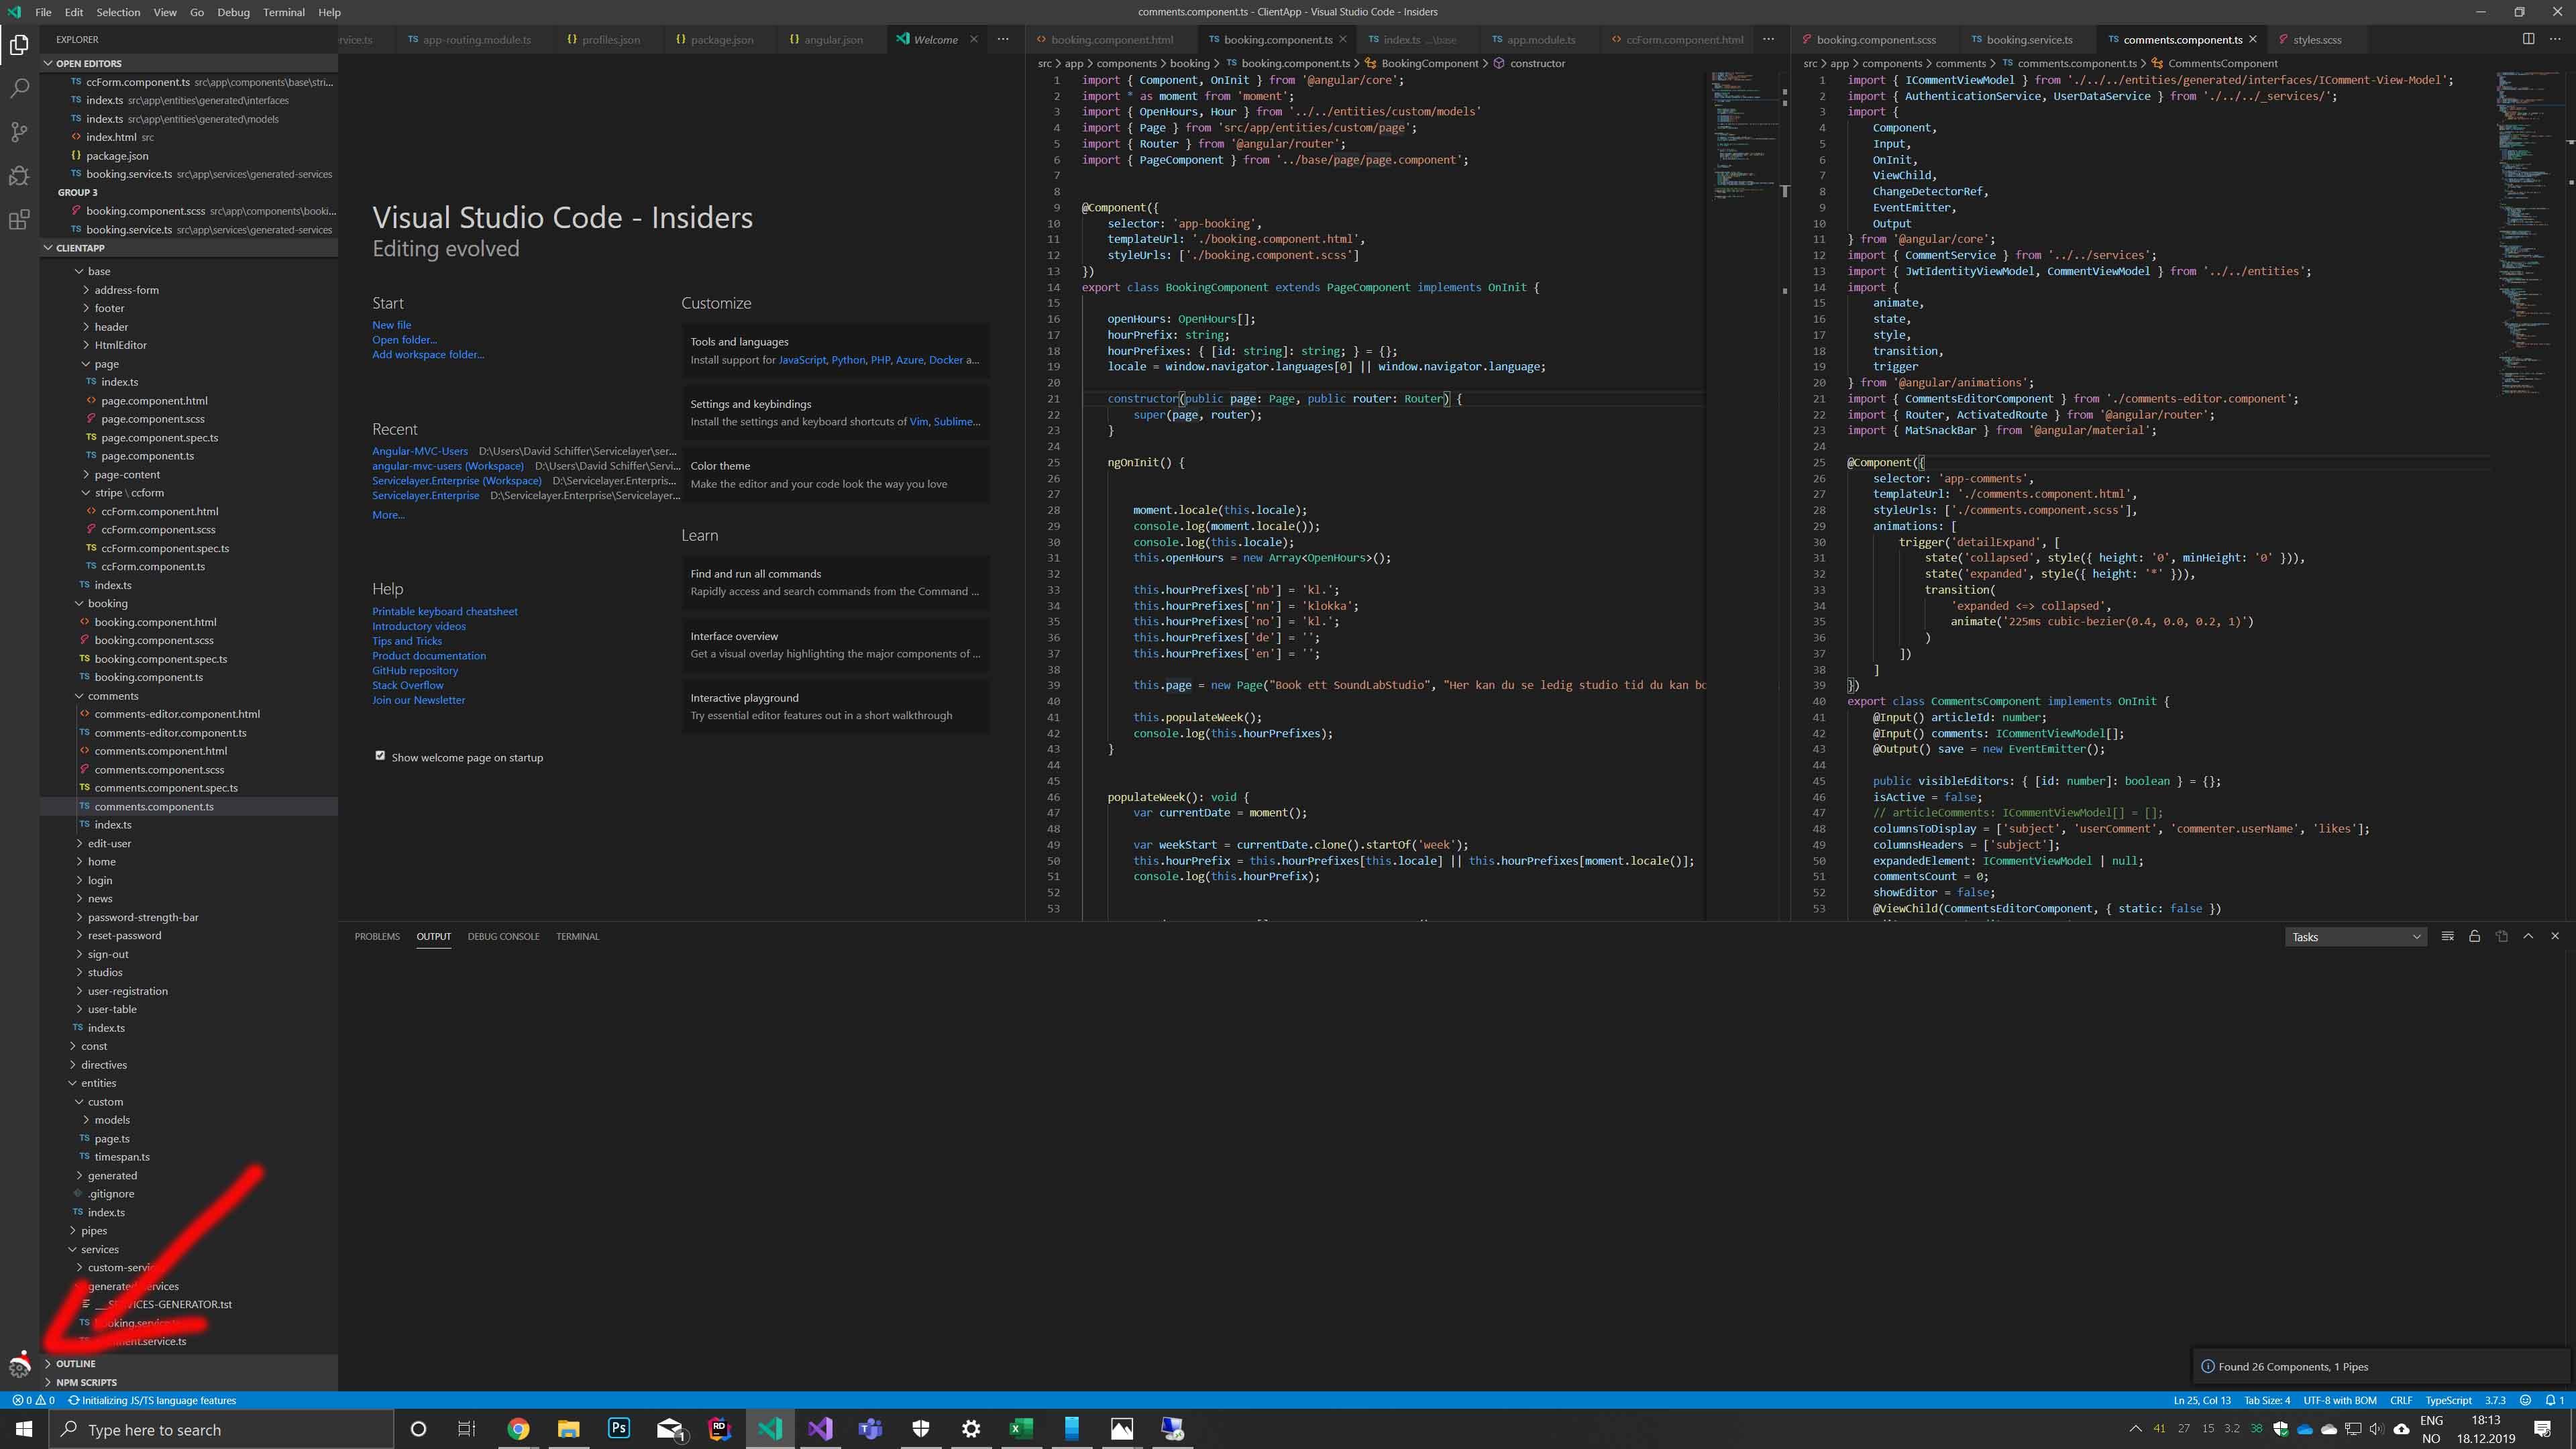 Microsoft рассорила и помирила пользователей из-за шапки Санта-Клауса на иконке в редакторе Visual Studio Code - 2